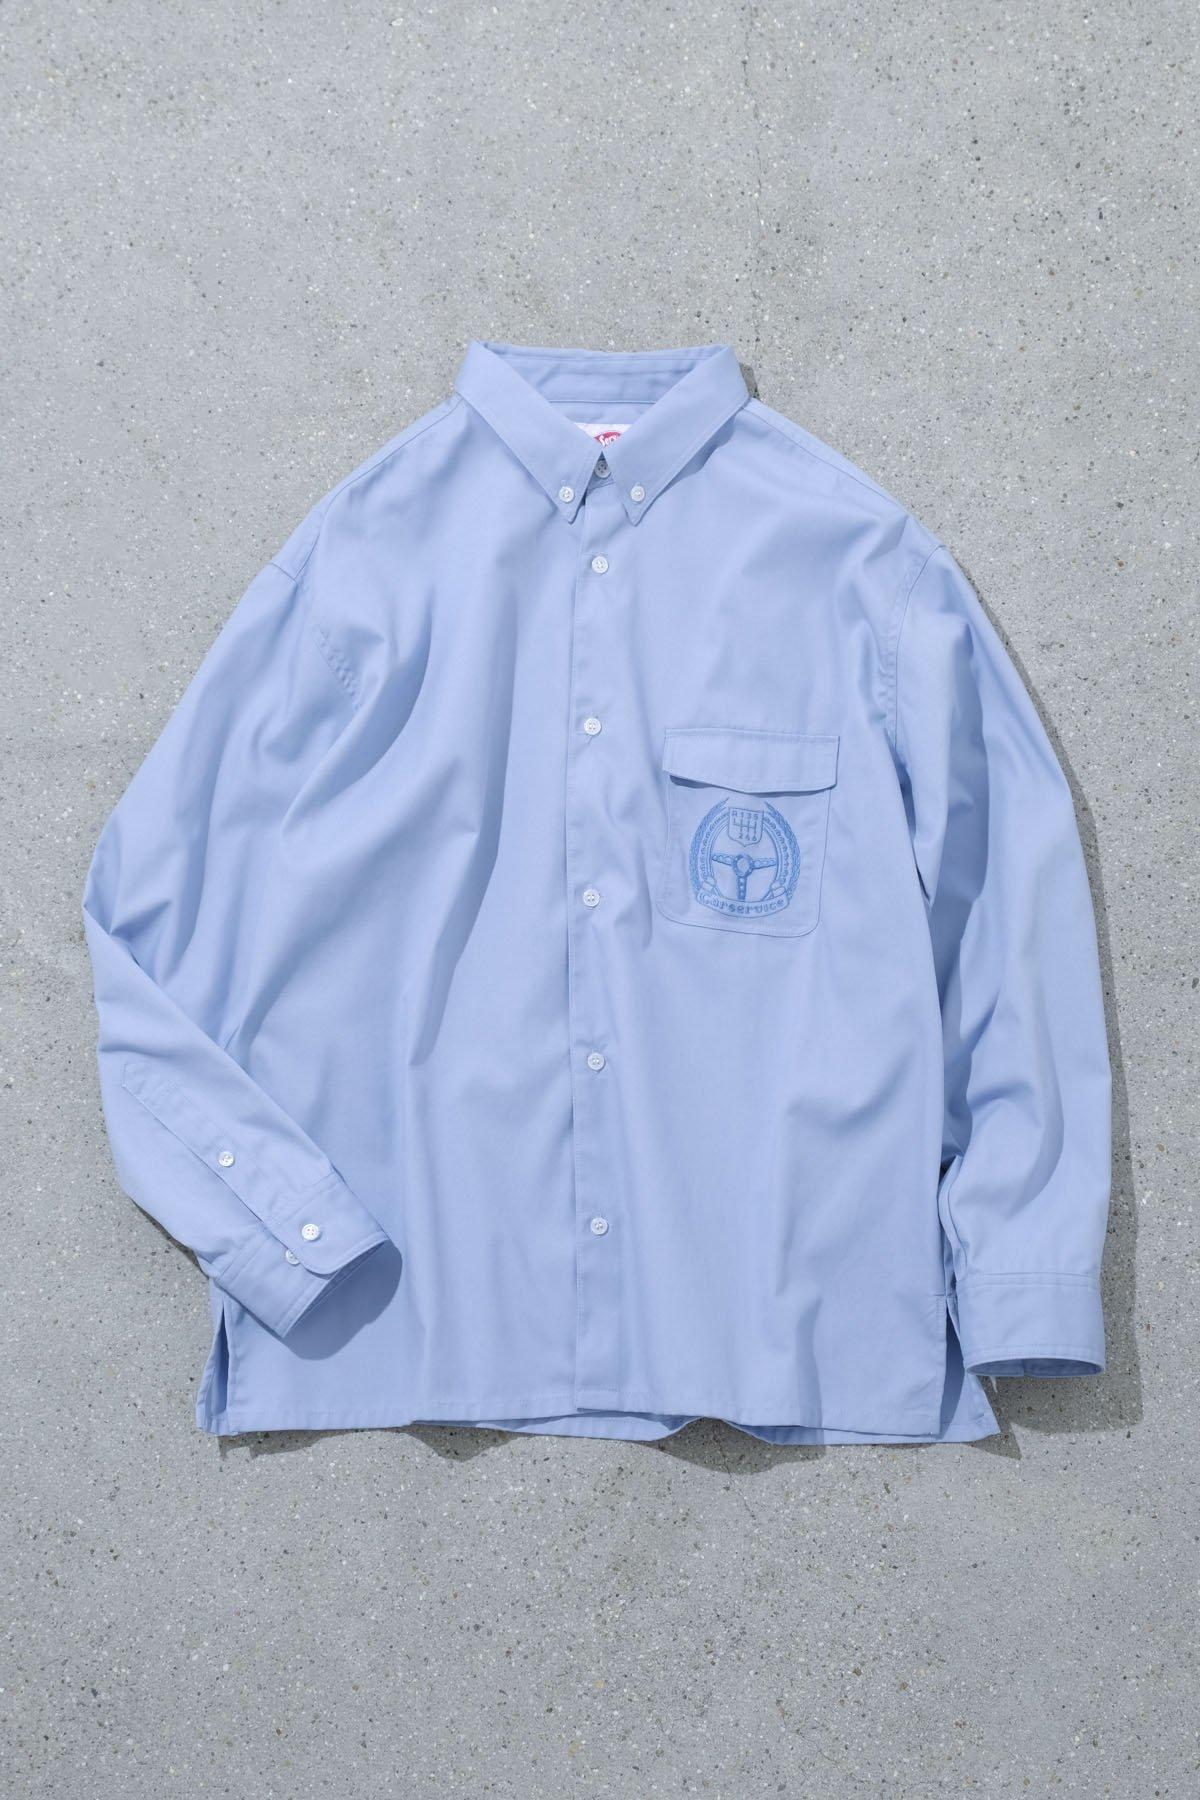 Carservice / CS Emblem B.D. Shirt